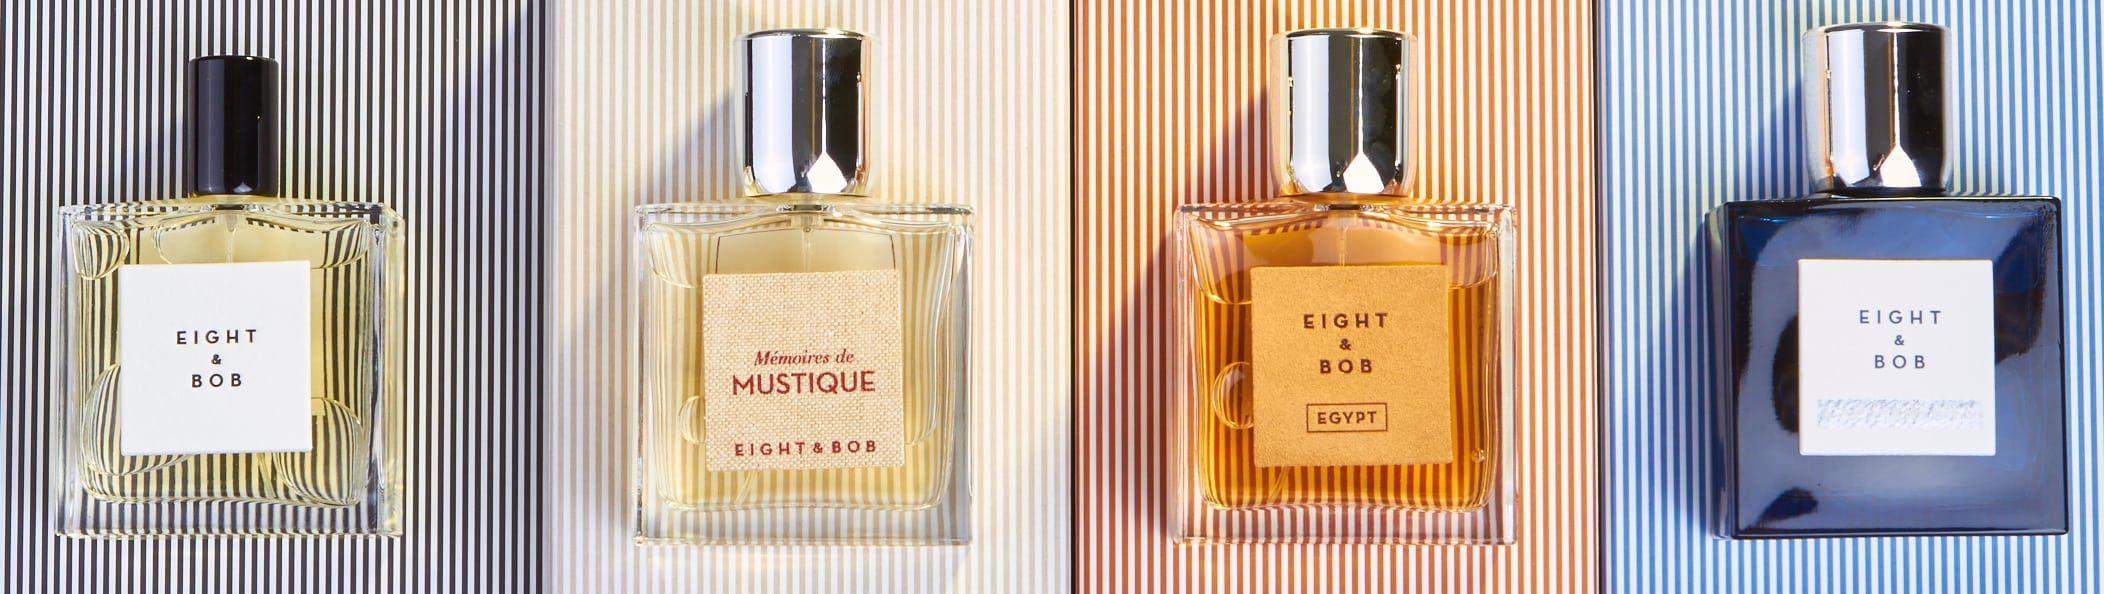 Eight & Bob fragrances